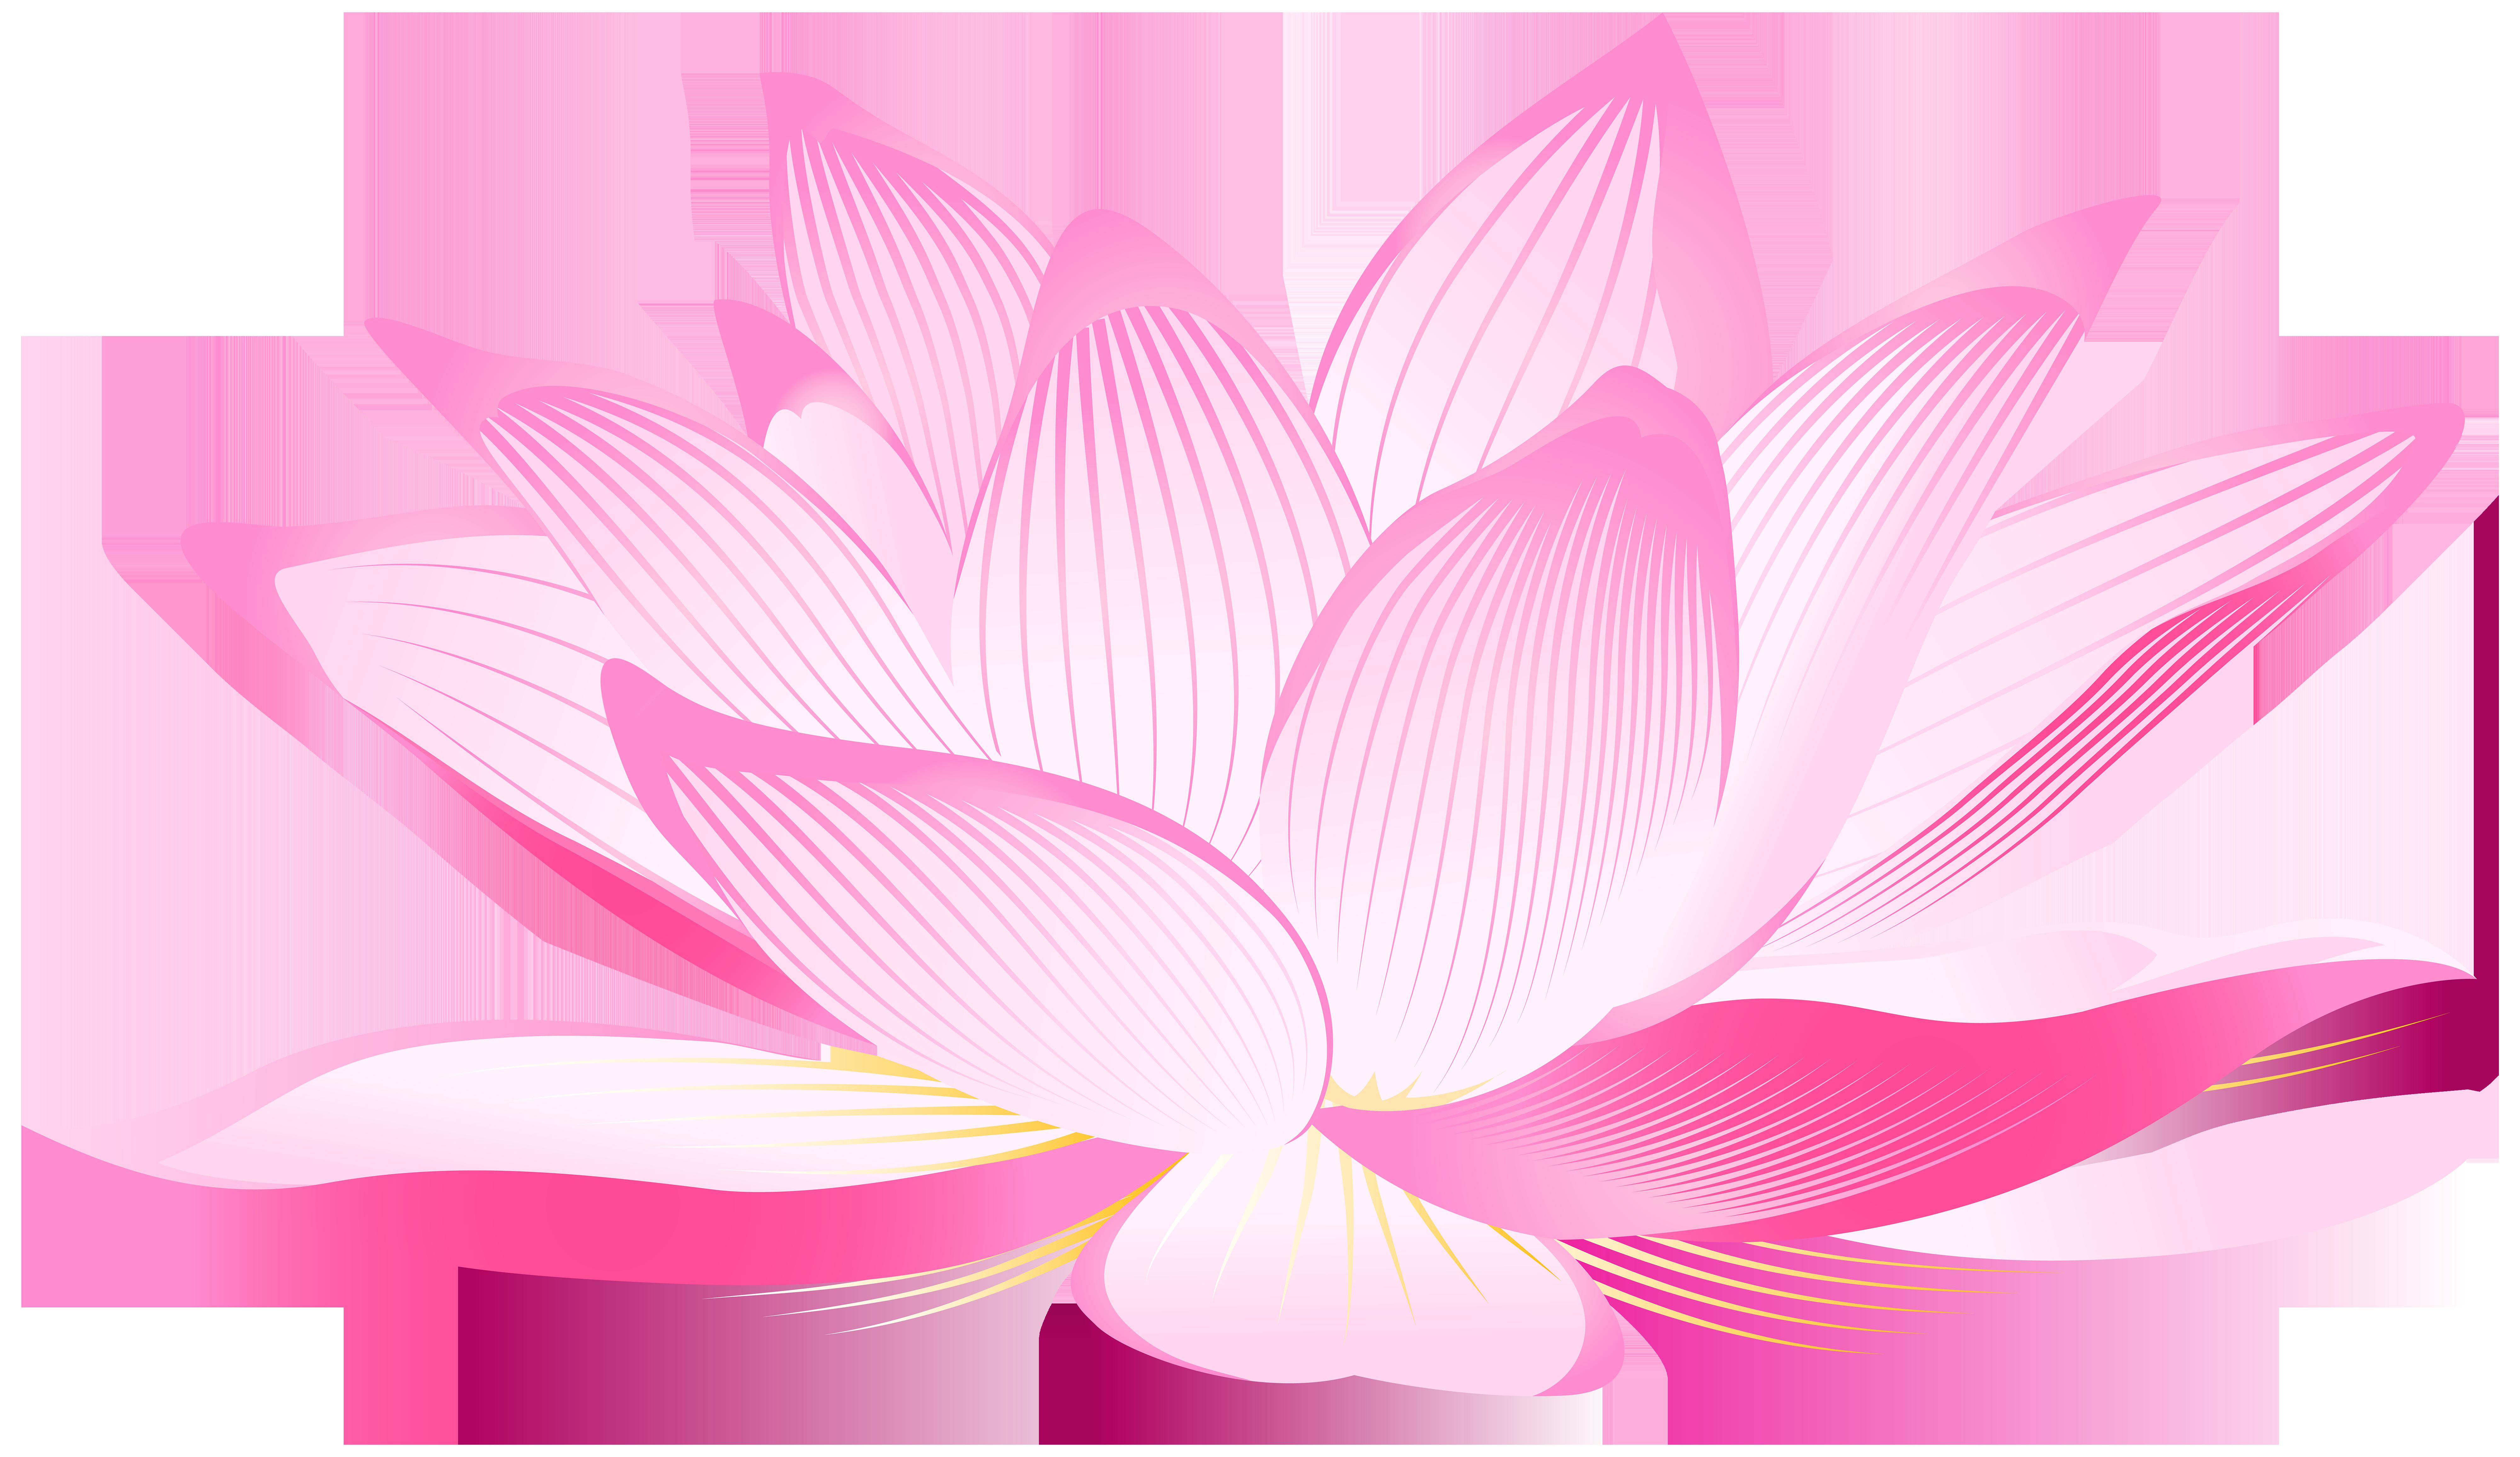 Png Lotus Flower Transparent Lotus Flower Png Images